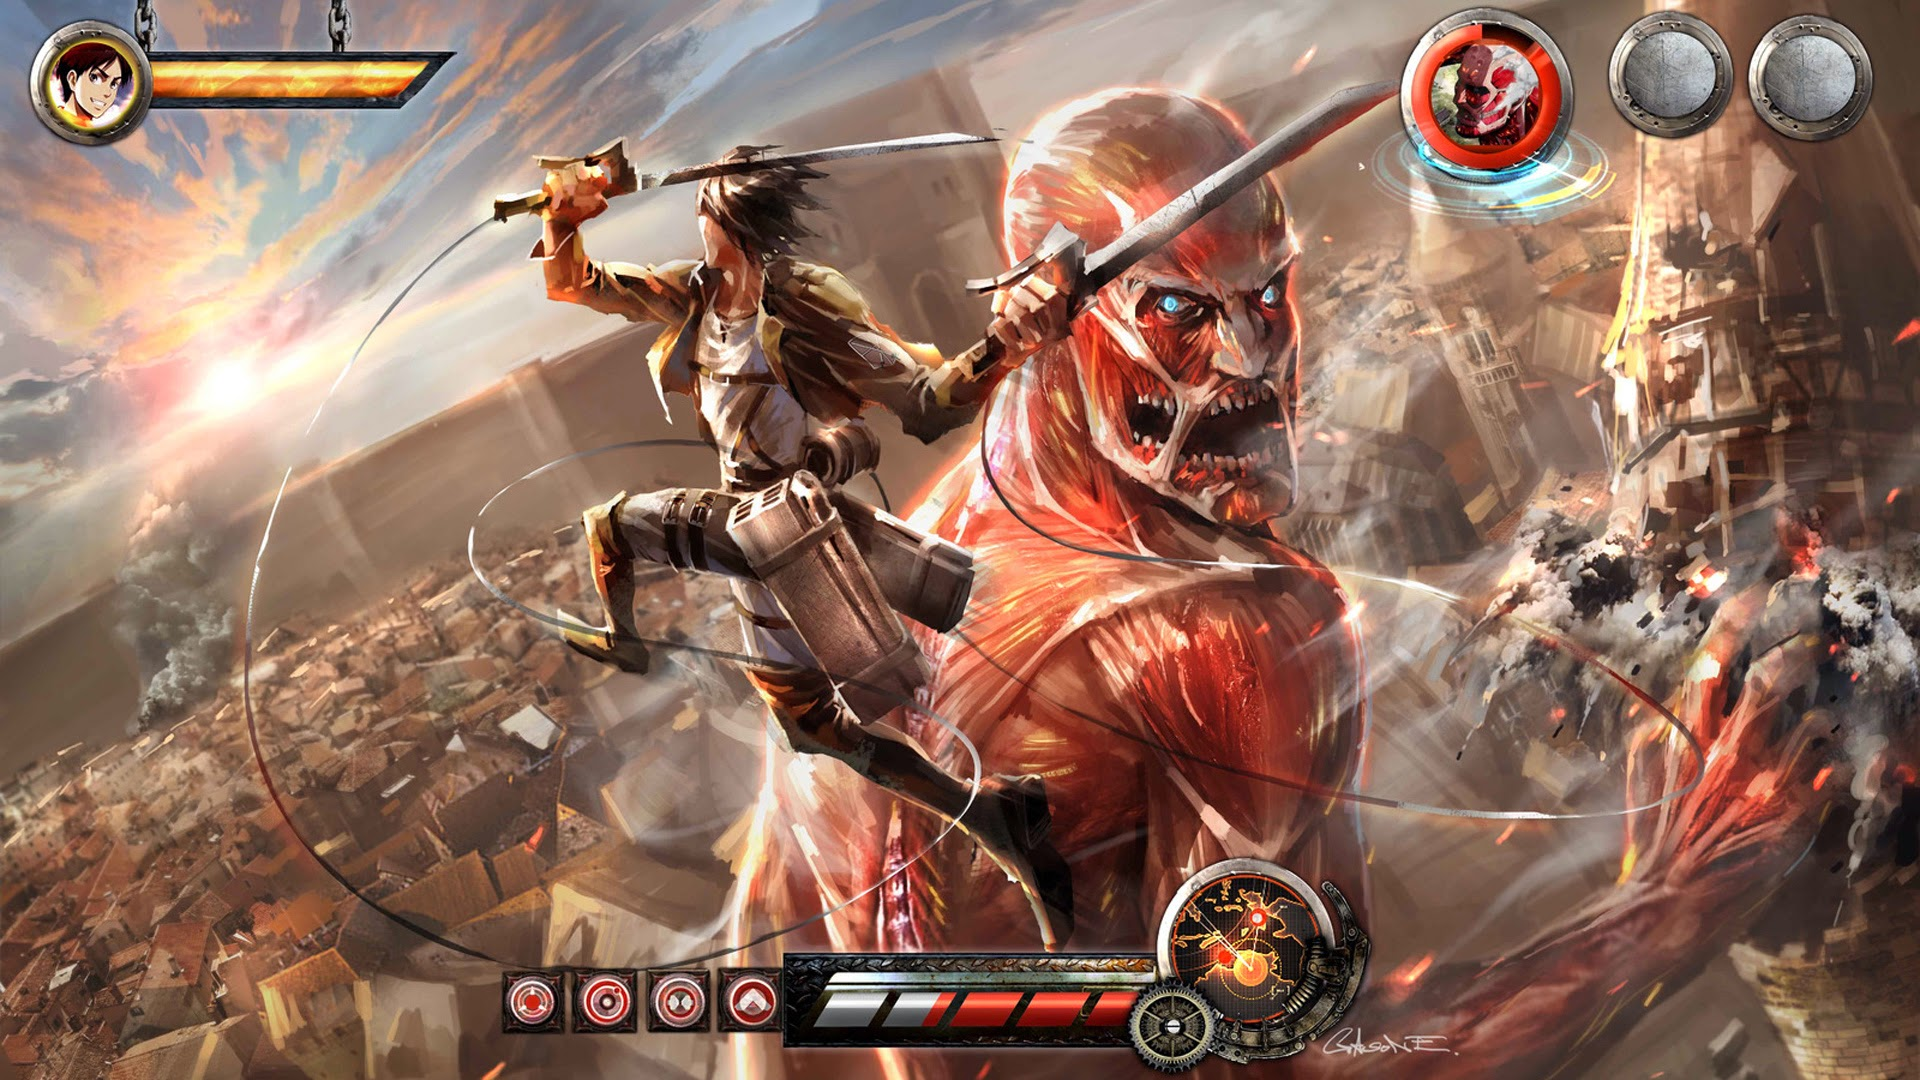 Attack On Titan Game Theme 55 HD Wallpaper